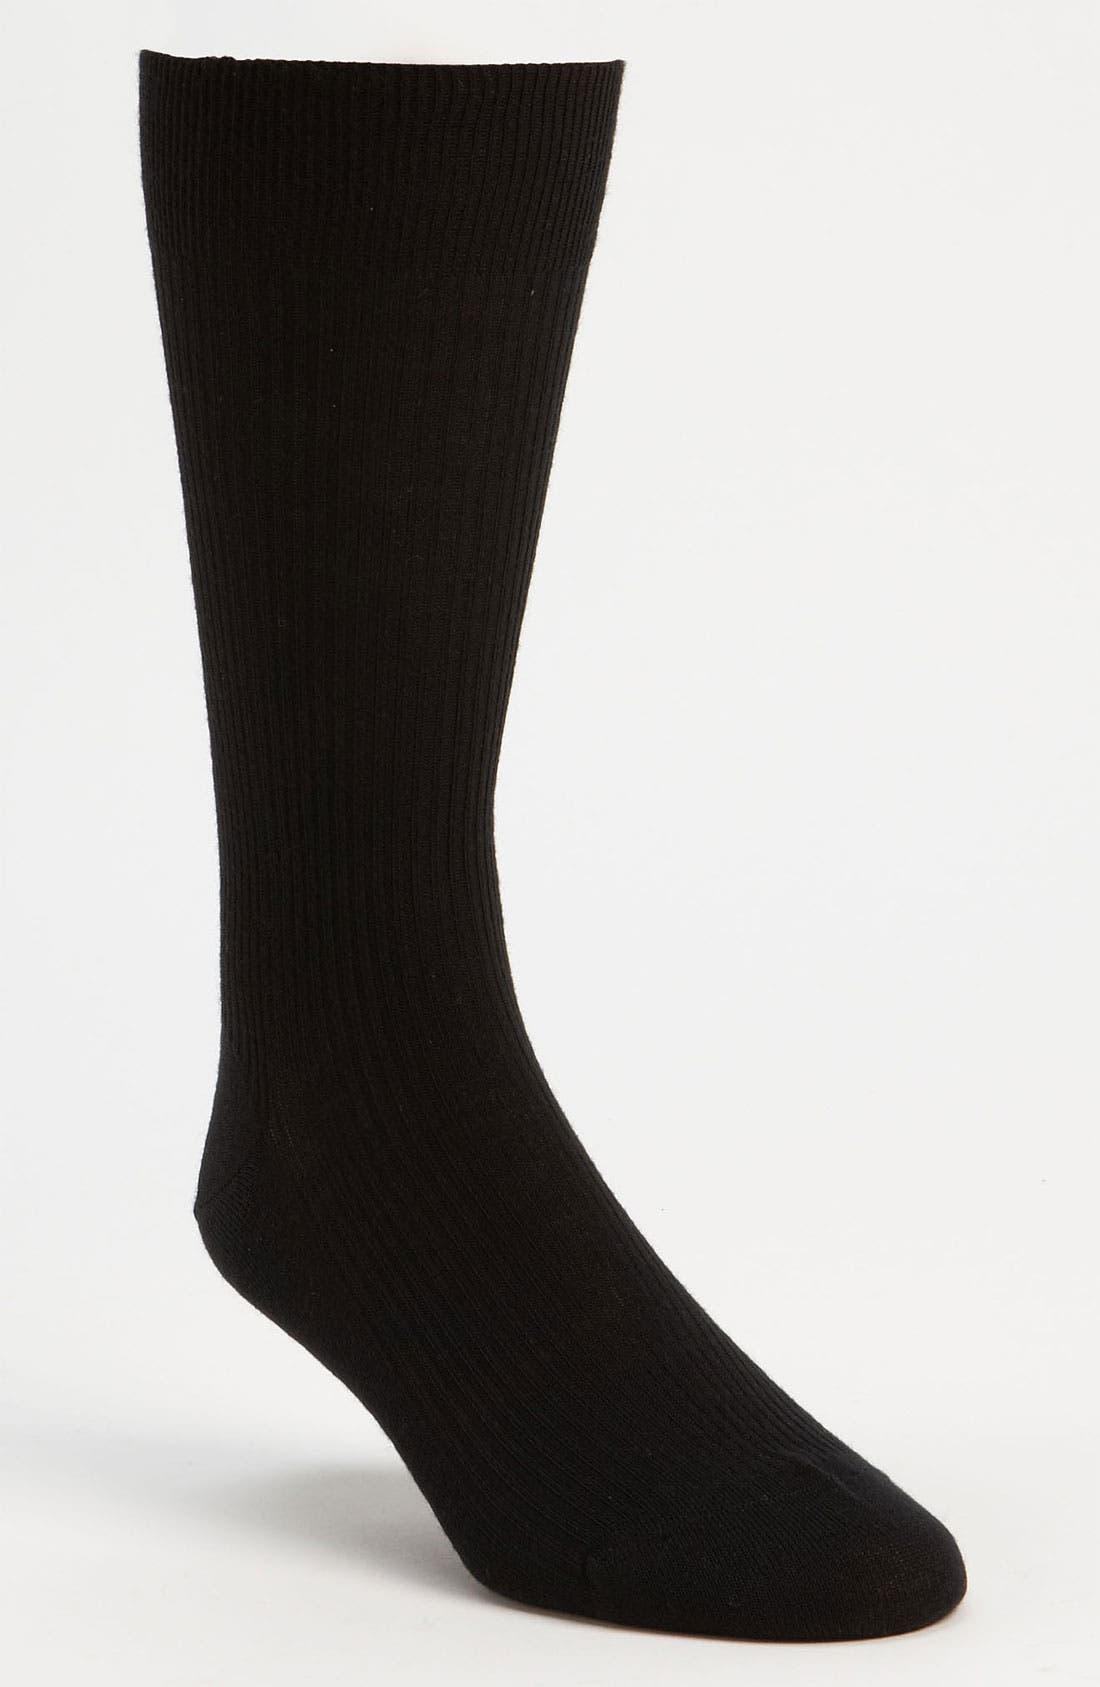 Alternate Image 1 Selected - Pantherella Merino Wool Mid Calf Dress Socks